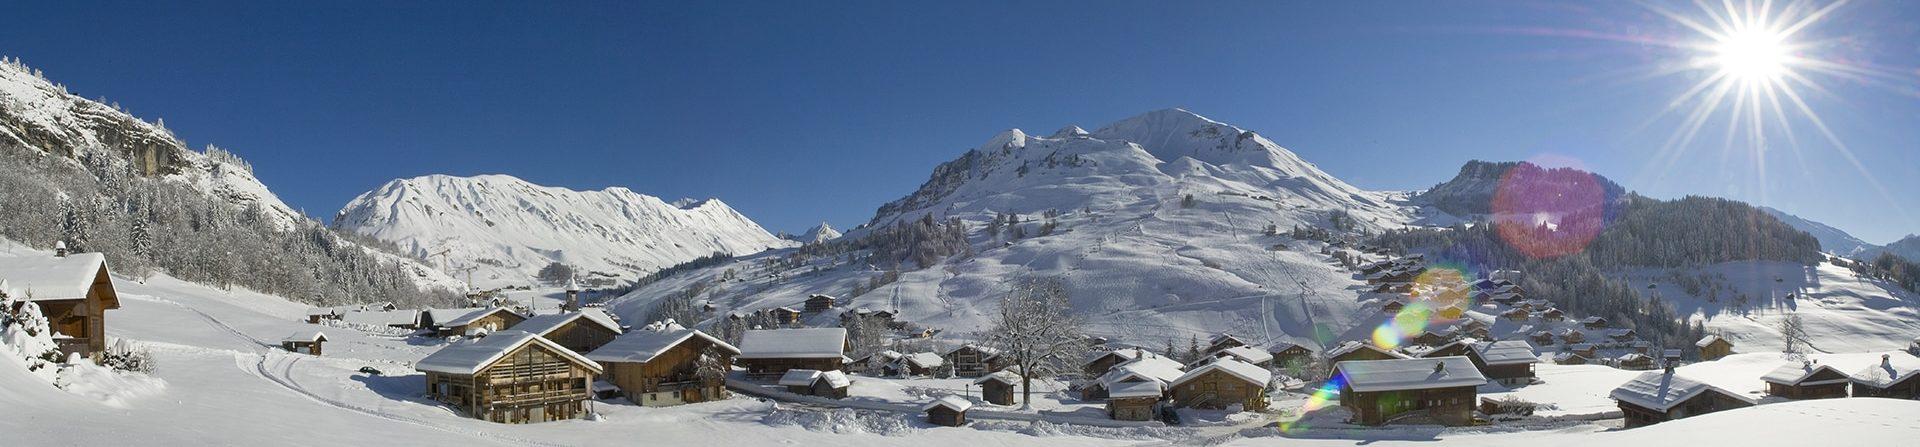 Le Chinaillon, Grand-Bornand sous la neige.